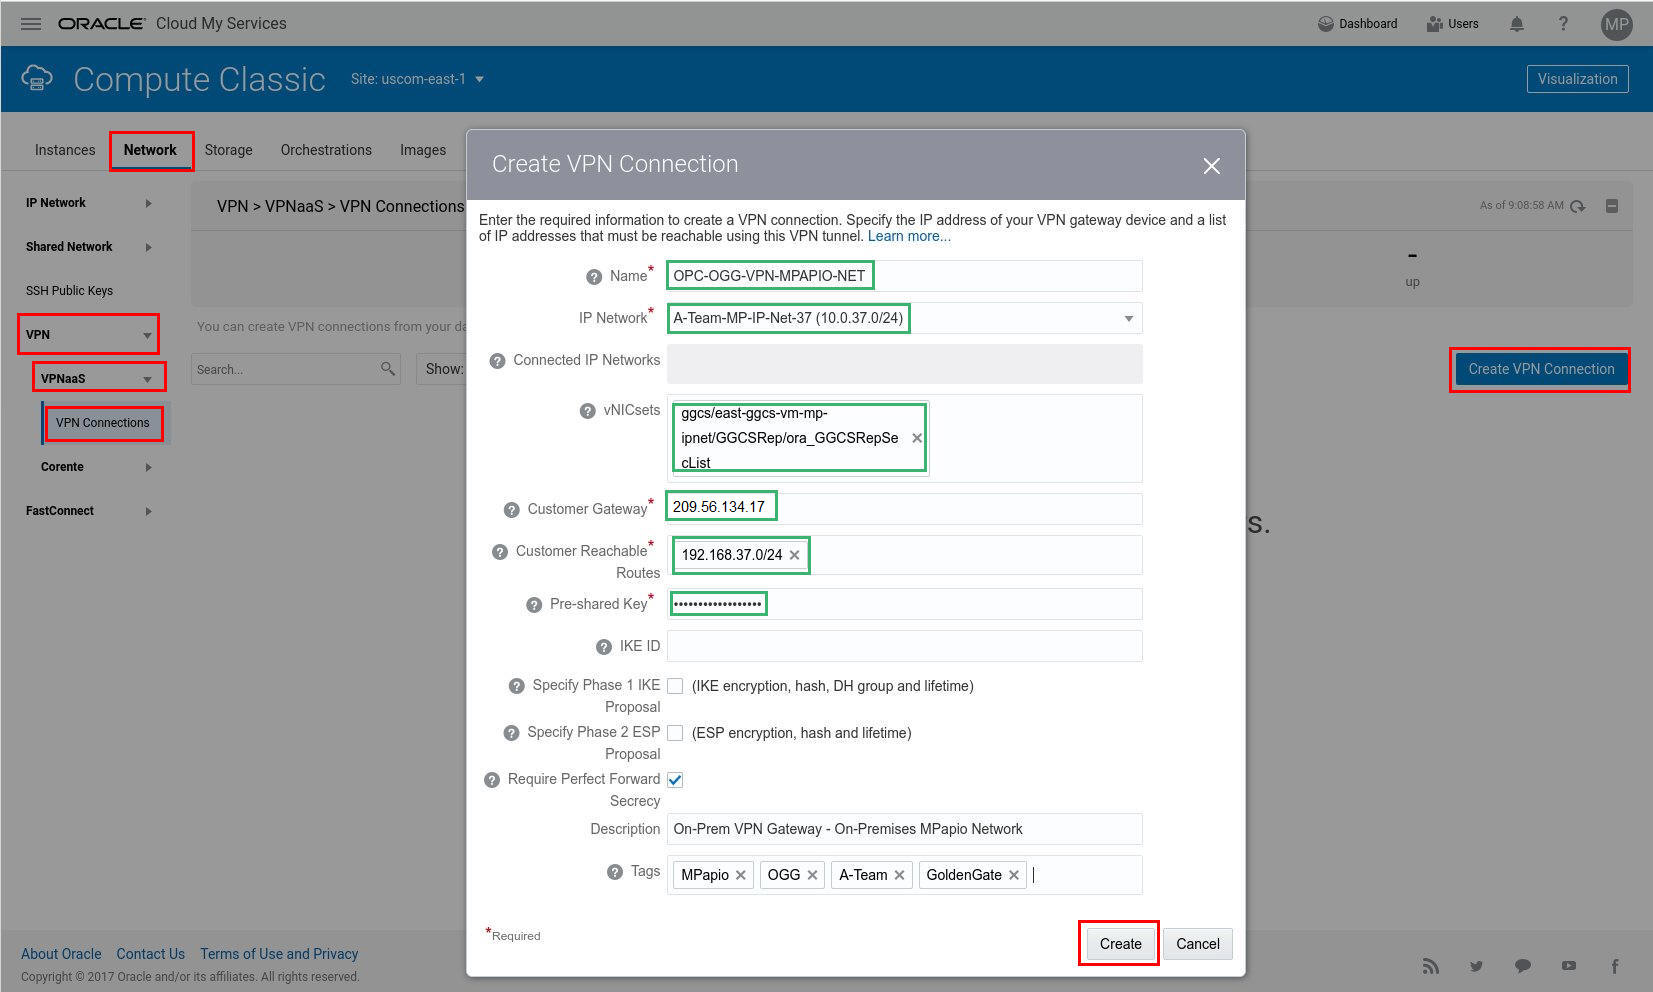 GoldenGate Cloud Service (GGCS): Using VPN as a Service (VPNaaS) for